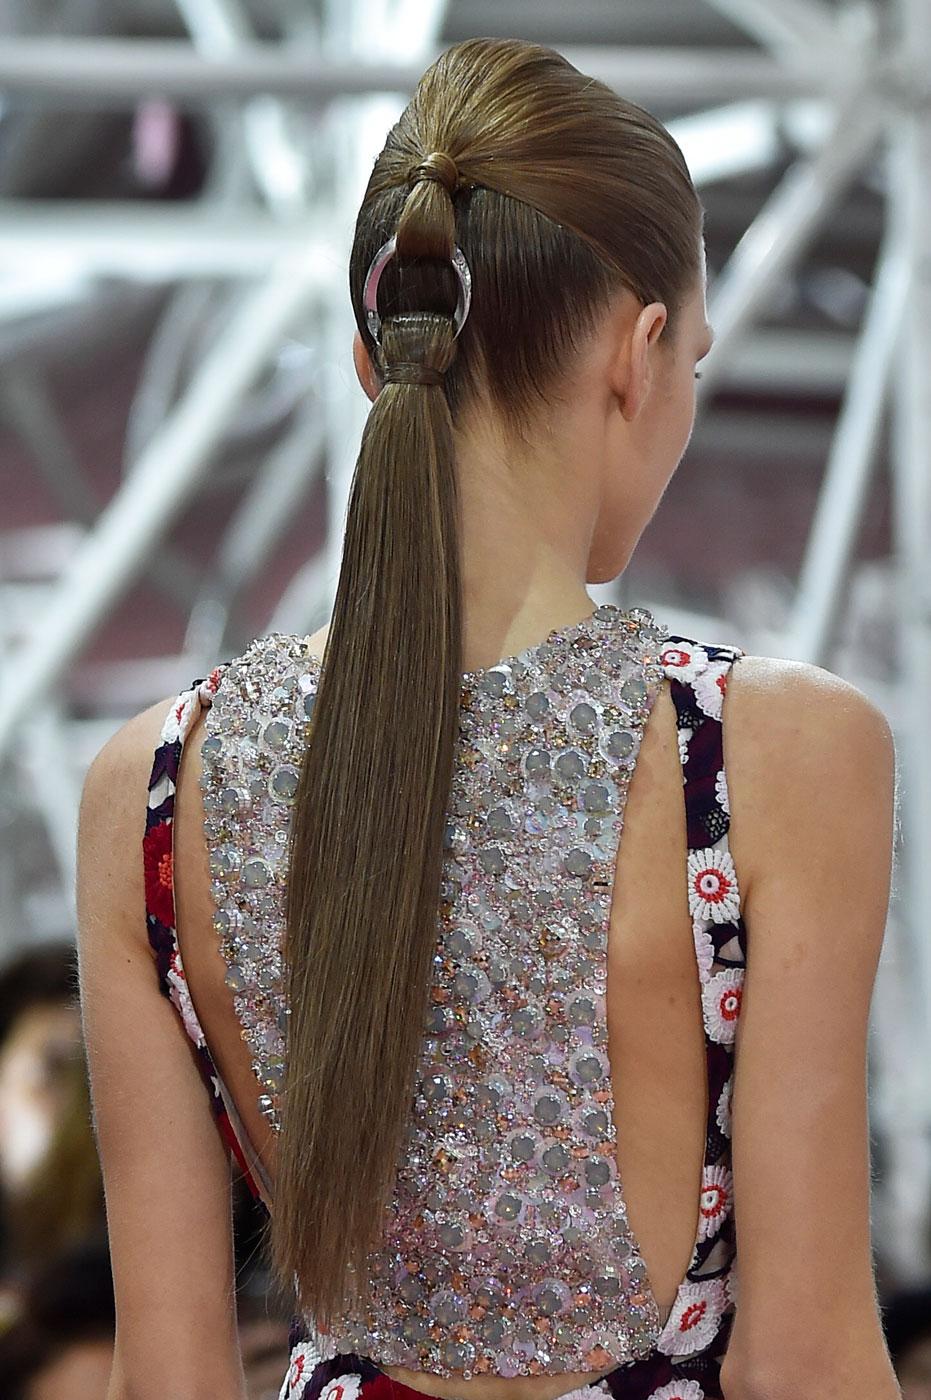 Christian-Dior-fashion-runway-show-close-ups-haute-couture-paris-spring-summer-2015-the-impression-066